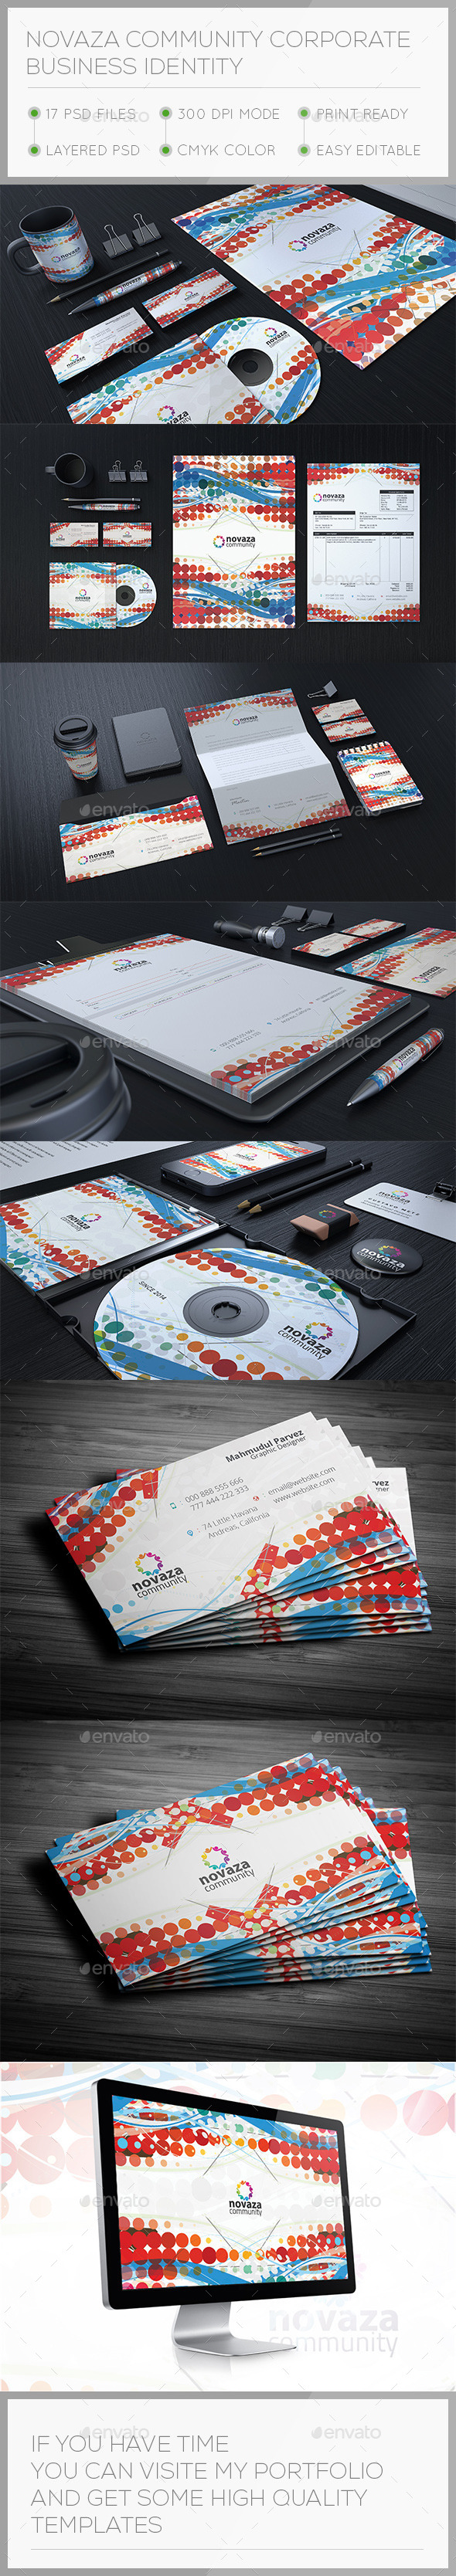 GraphicRiver Novaza Corporate Stationary Identity 10063695